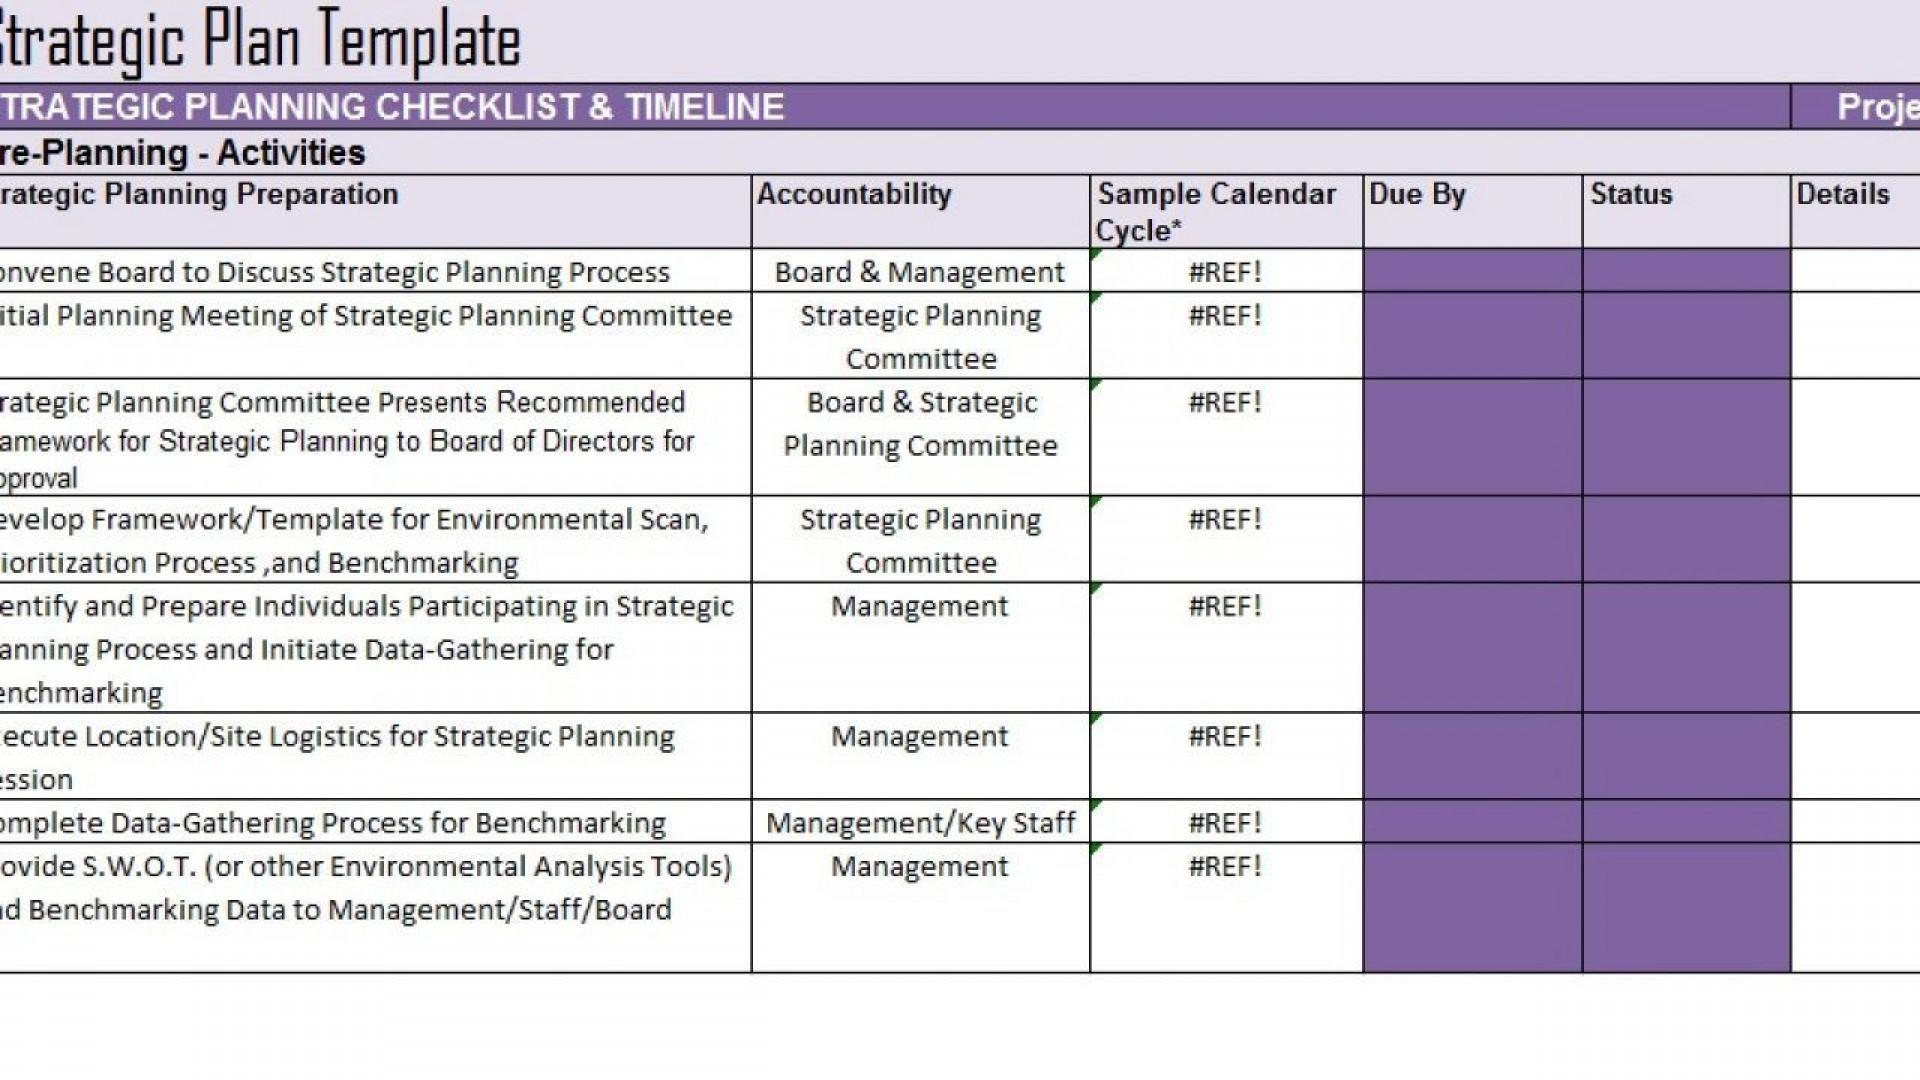 005 Impressive Strategic Planning Template Free High Def  Excel 6 It For Cio1920